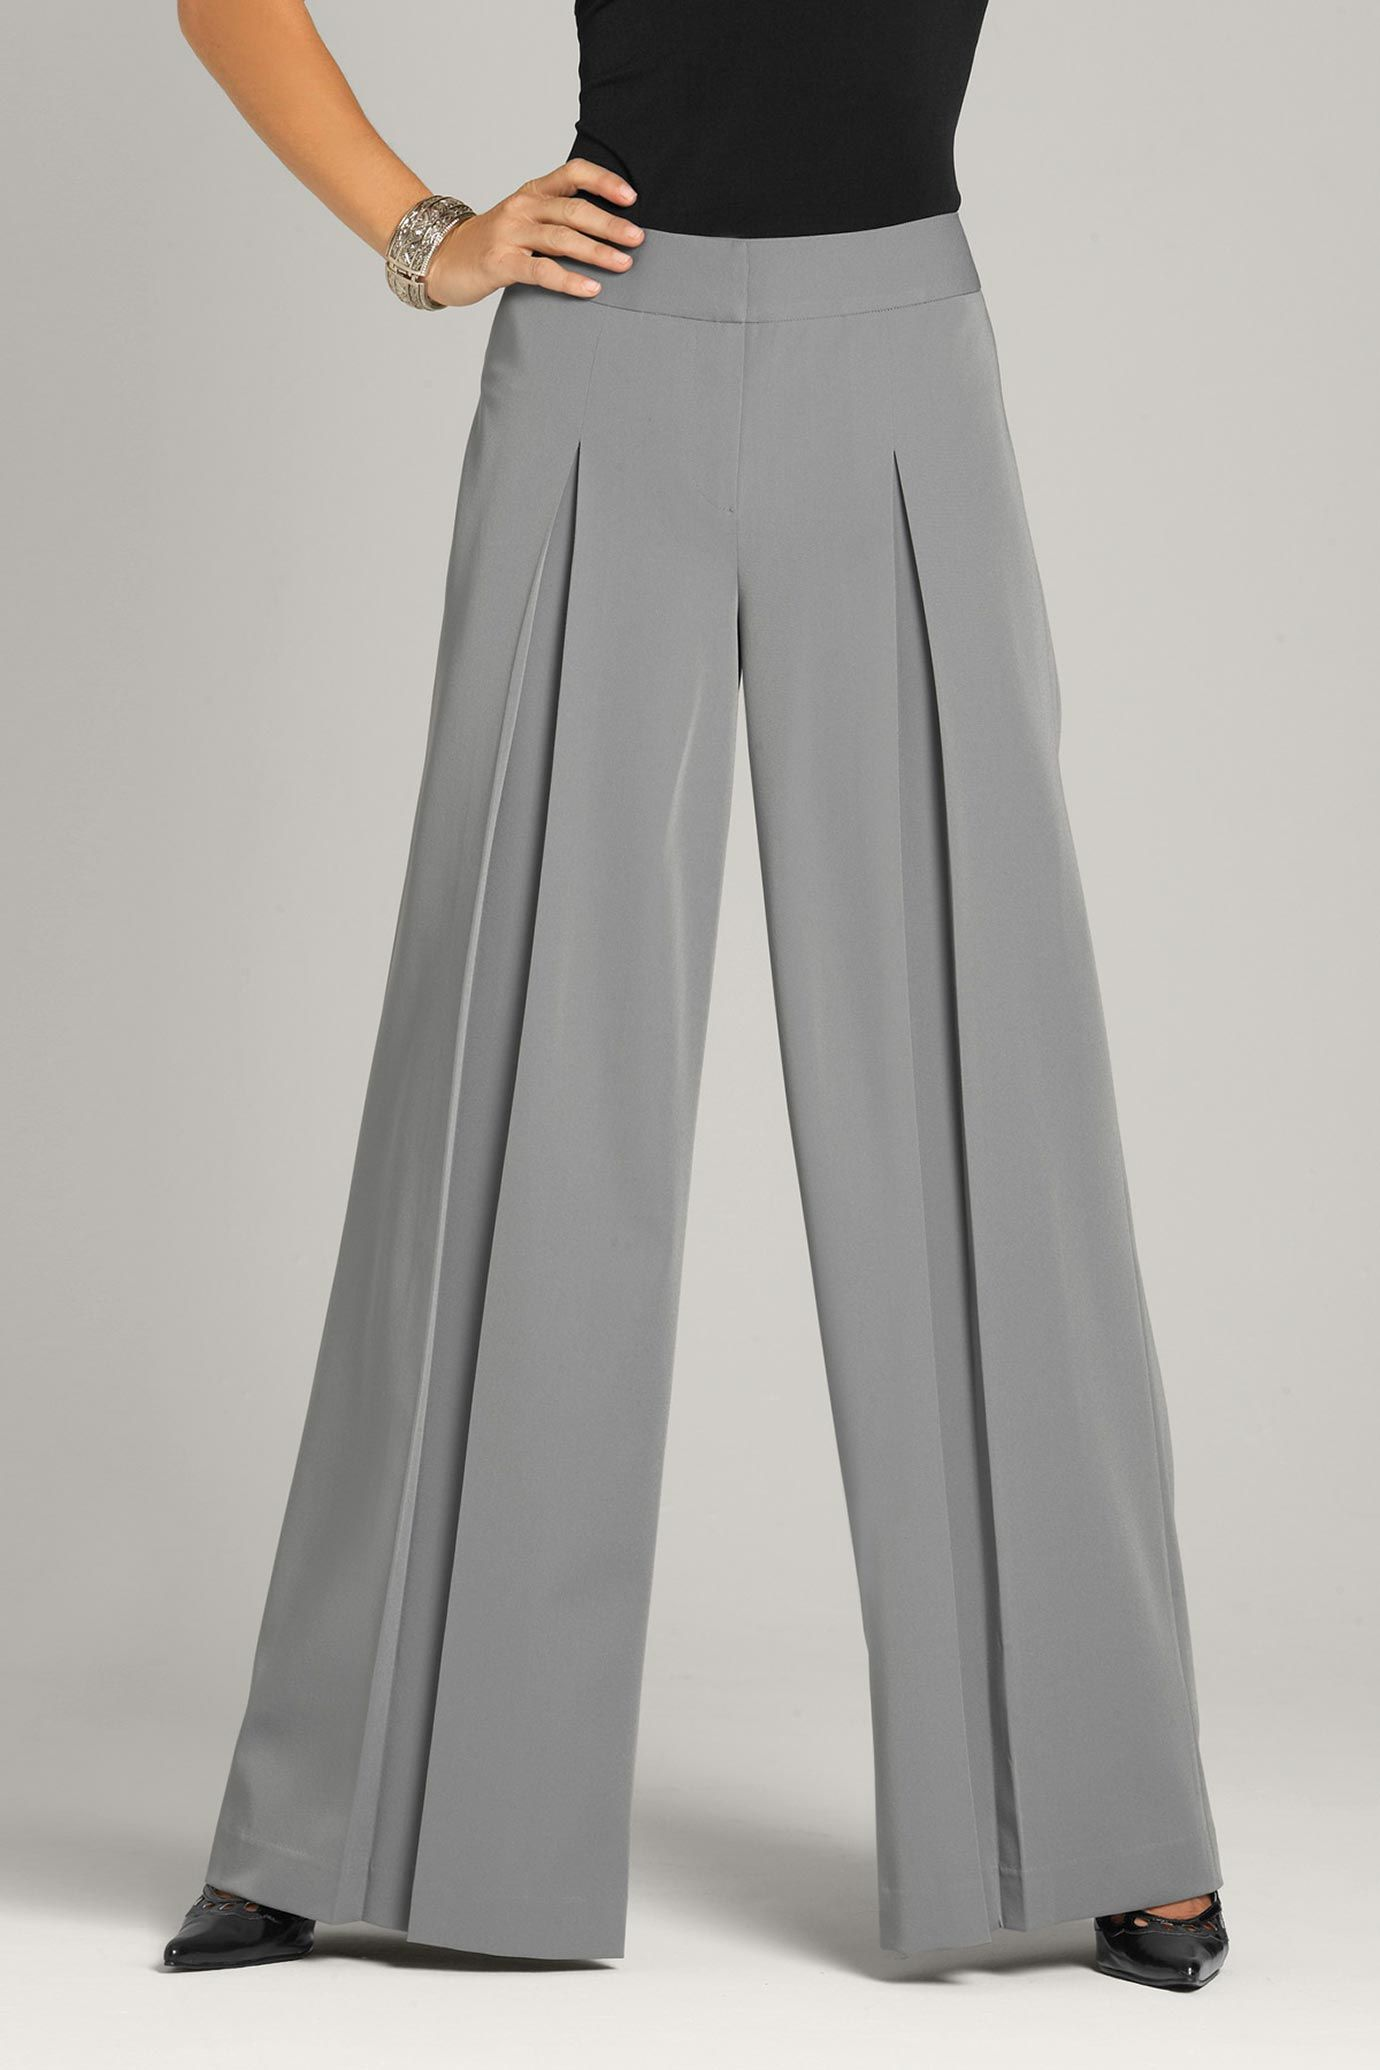 c7cde1a63f palazzo pants | Pleated Palazzo Pant--- LOVE the pleat!!! ~Viking princess